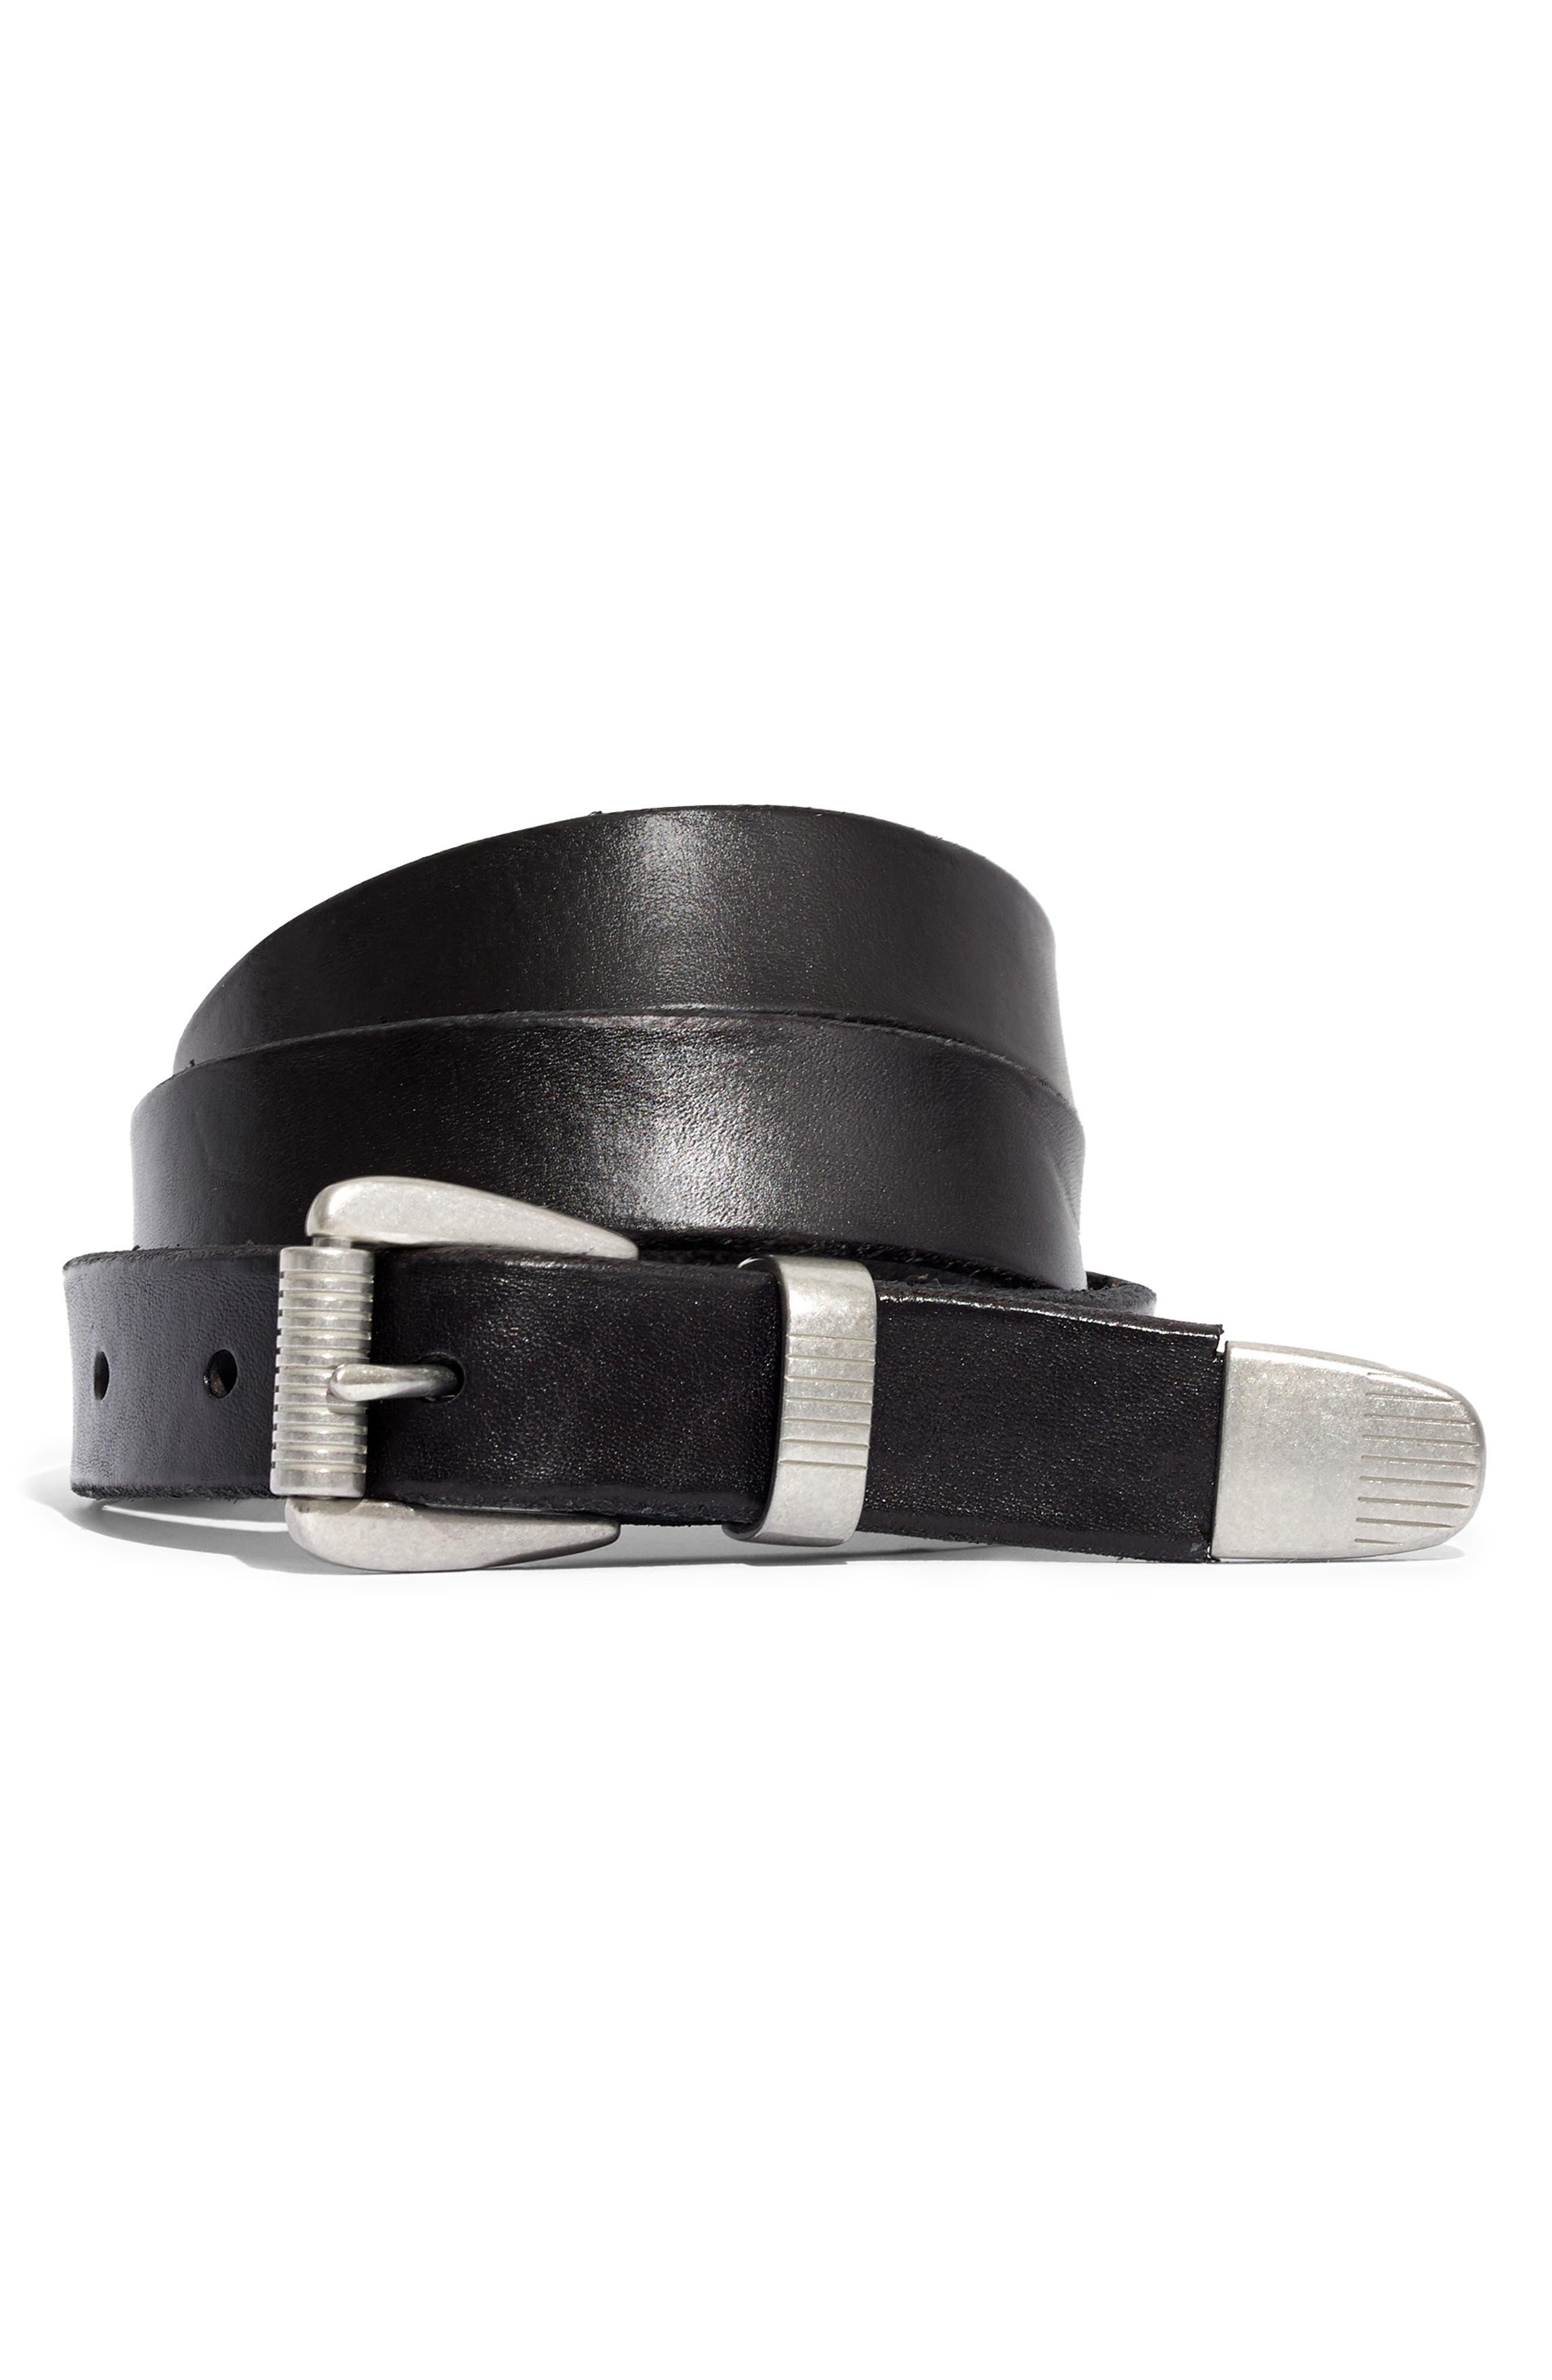 MADEWELL, Leather Three-Piece Belt, Main thumbnail 1, color, TRUE BLACK